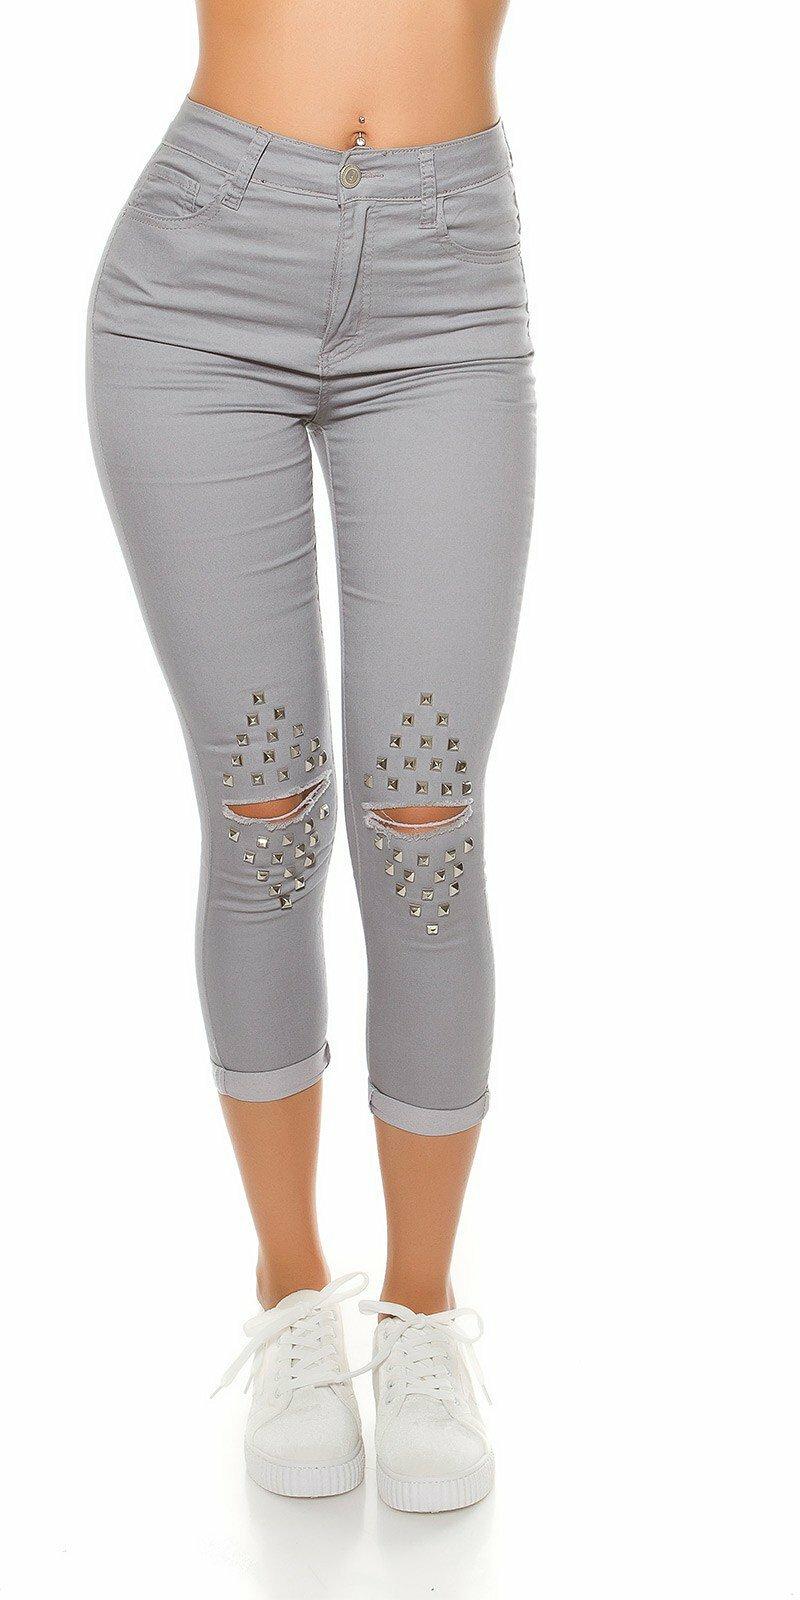 46315cde96e8 Dámske džínsy s vysokým pásom a rozparkami na kolenách ...